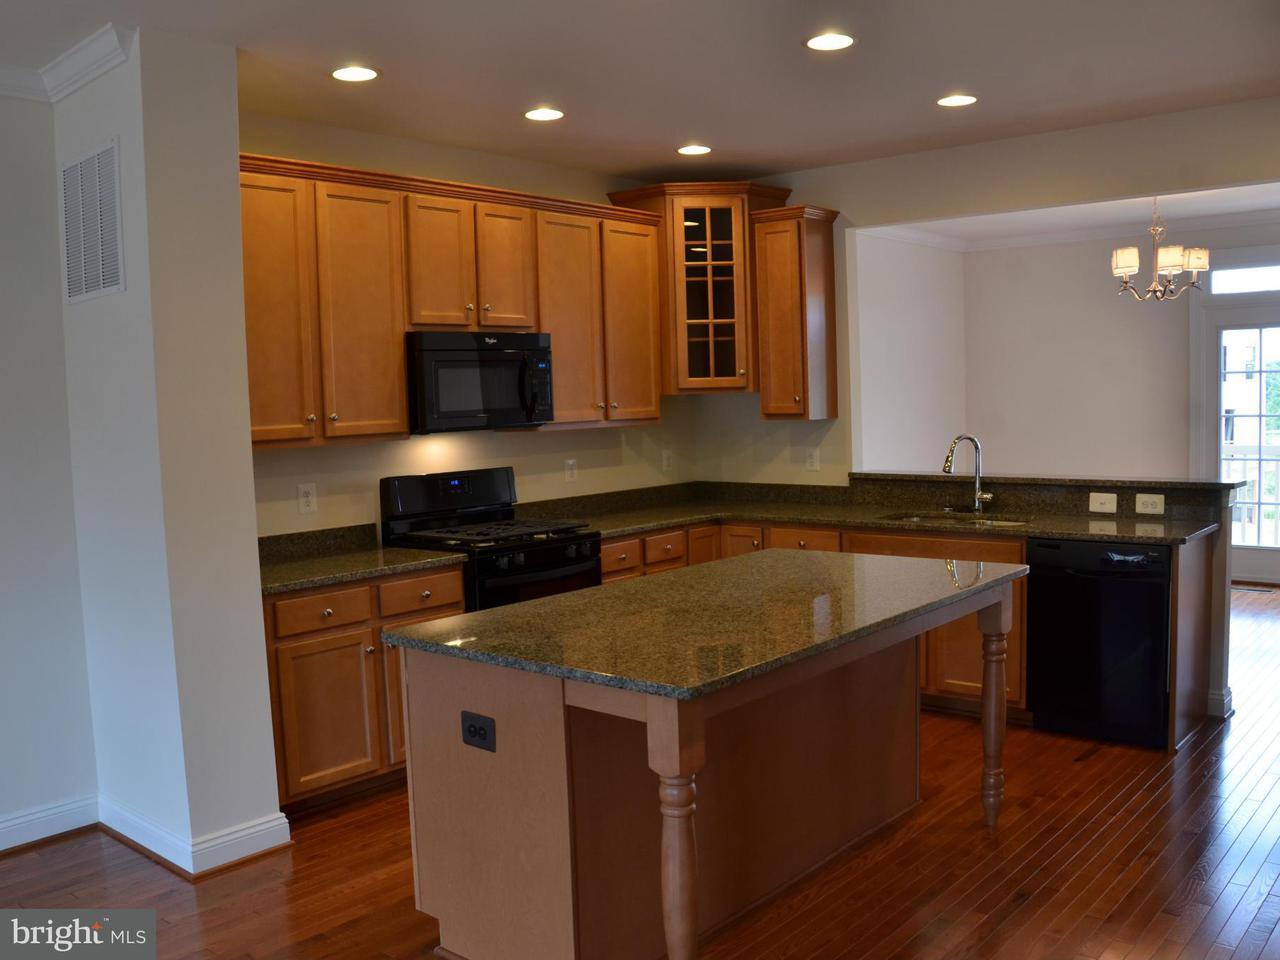 Additional photo for property listing at 7905 YELLOWSTONE WAY 7905 YELLOWSTONE WAY Derwood, Μεριλαντ 20855 Ηνωμενεσ Πολιτειεσ